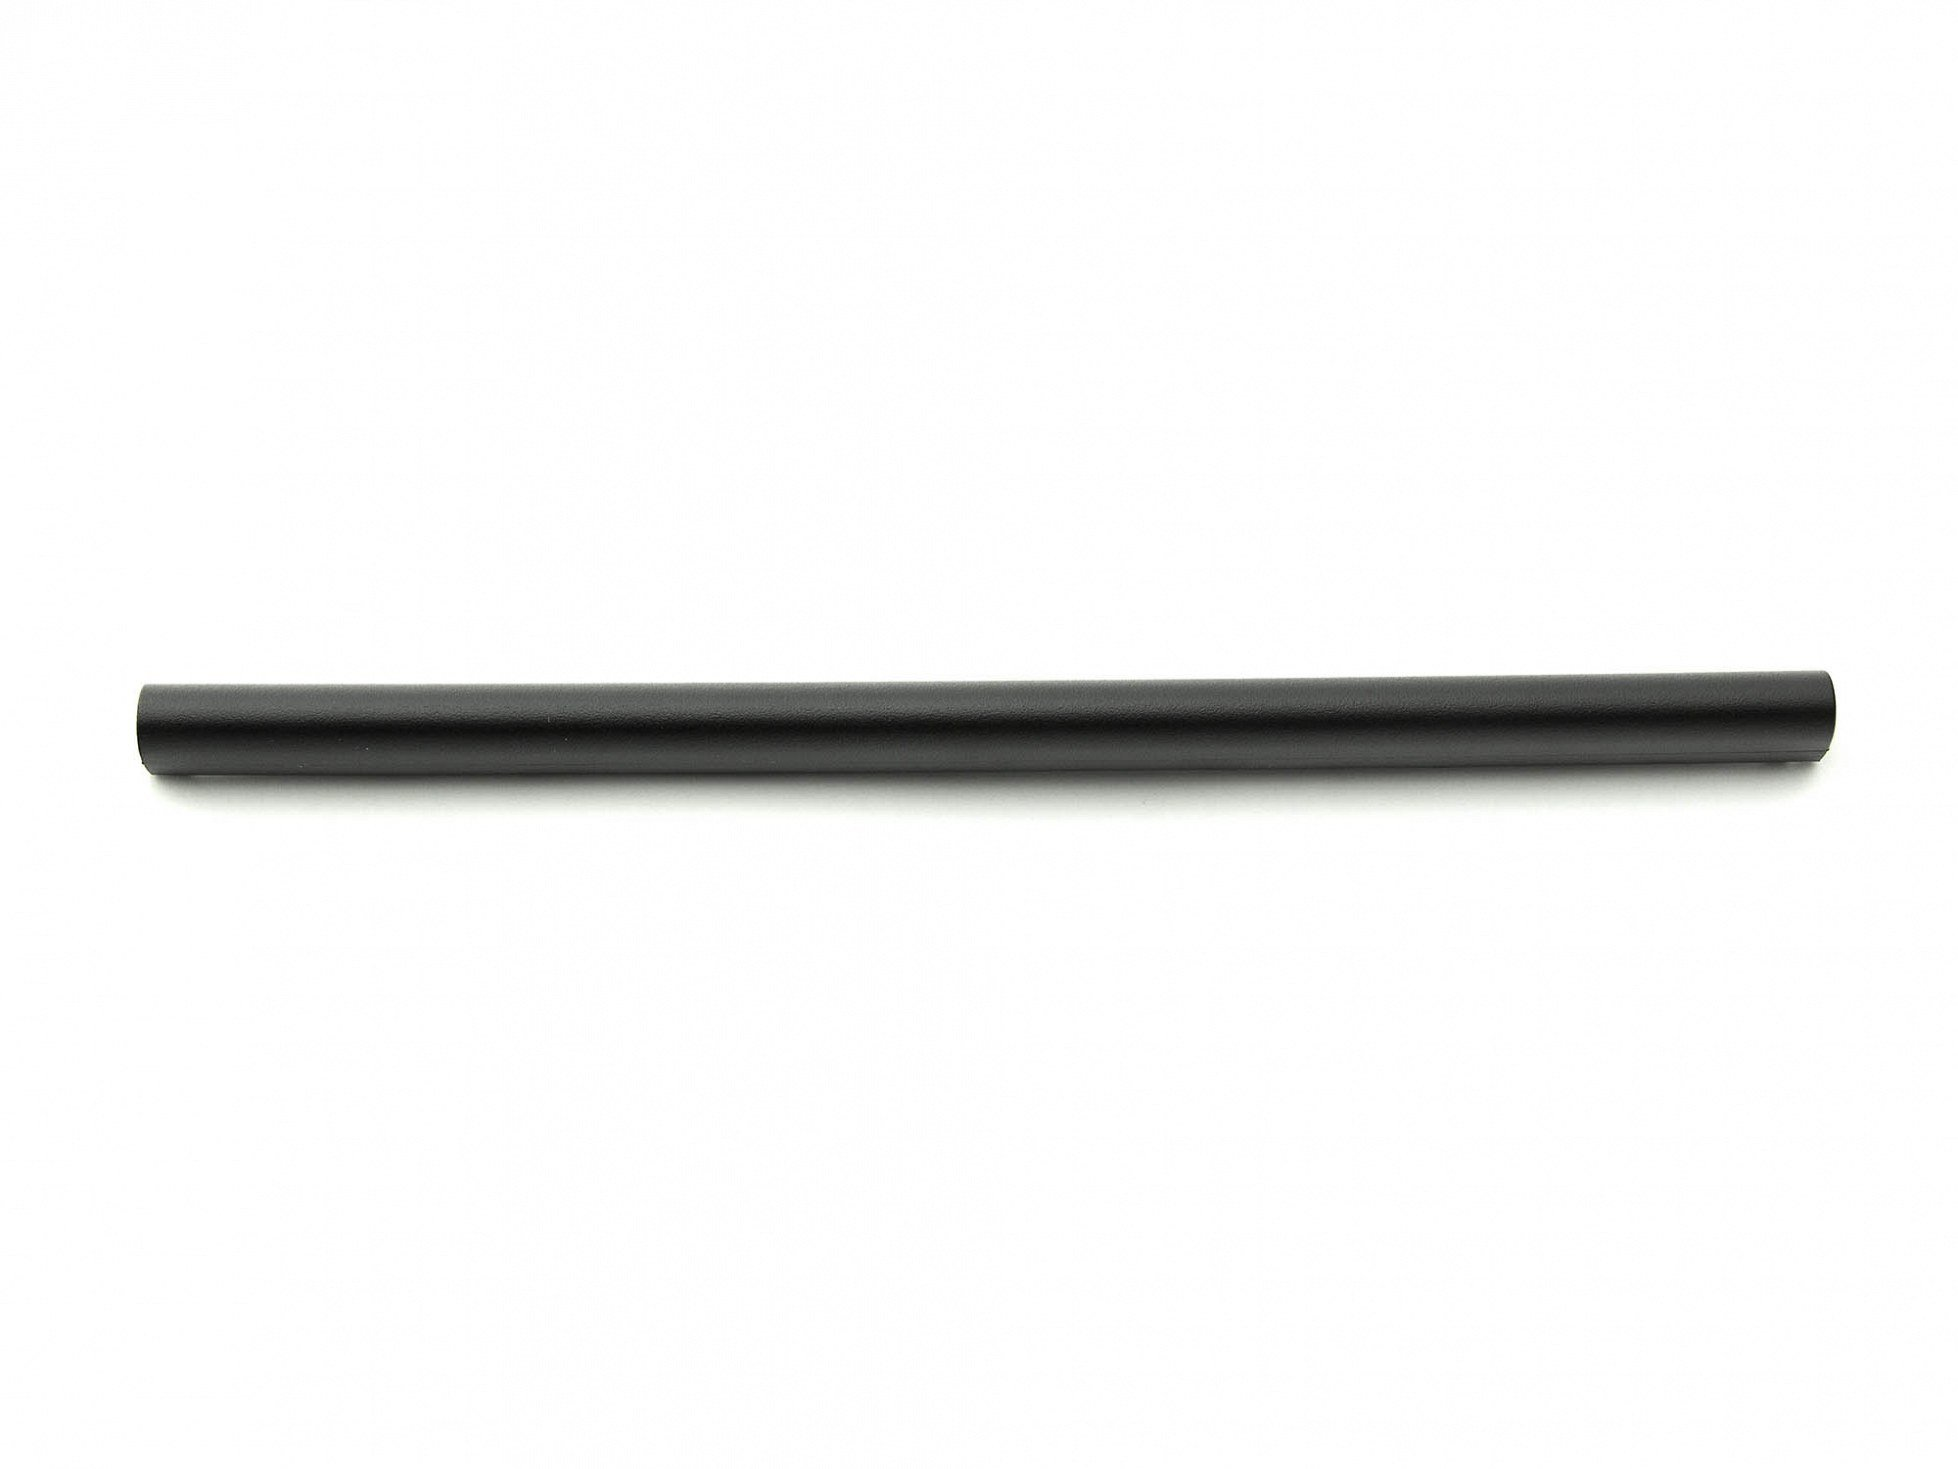 AJParts Replacement Asus VivoBook S510U laptop Screen 15.6 B156HAN02.1 HW3A LED LCD IPS Display